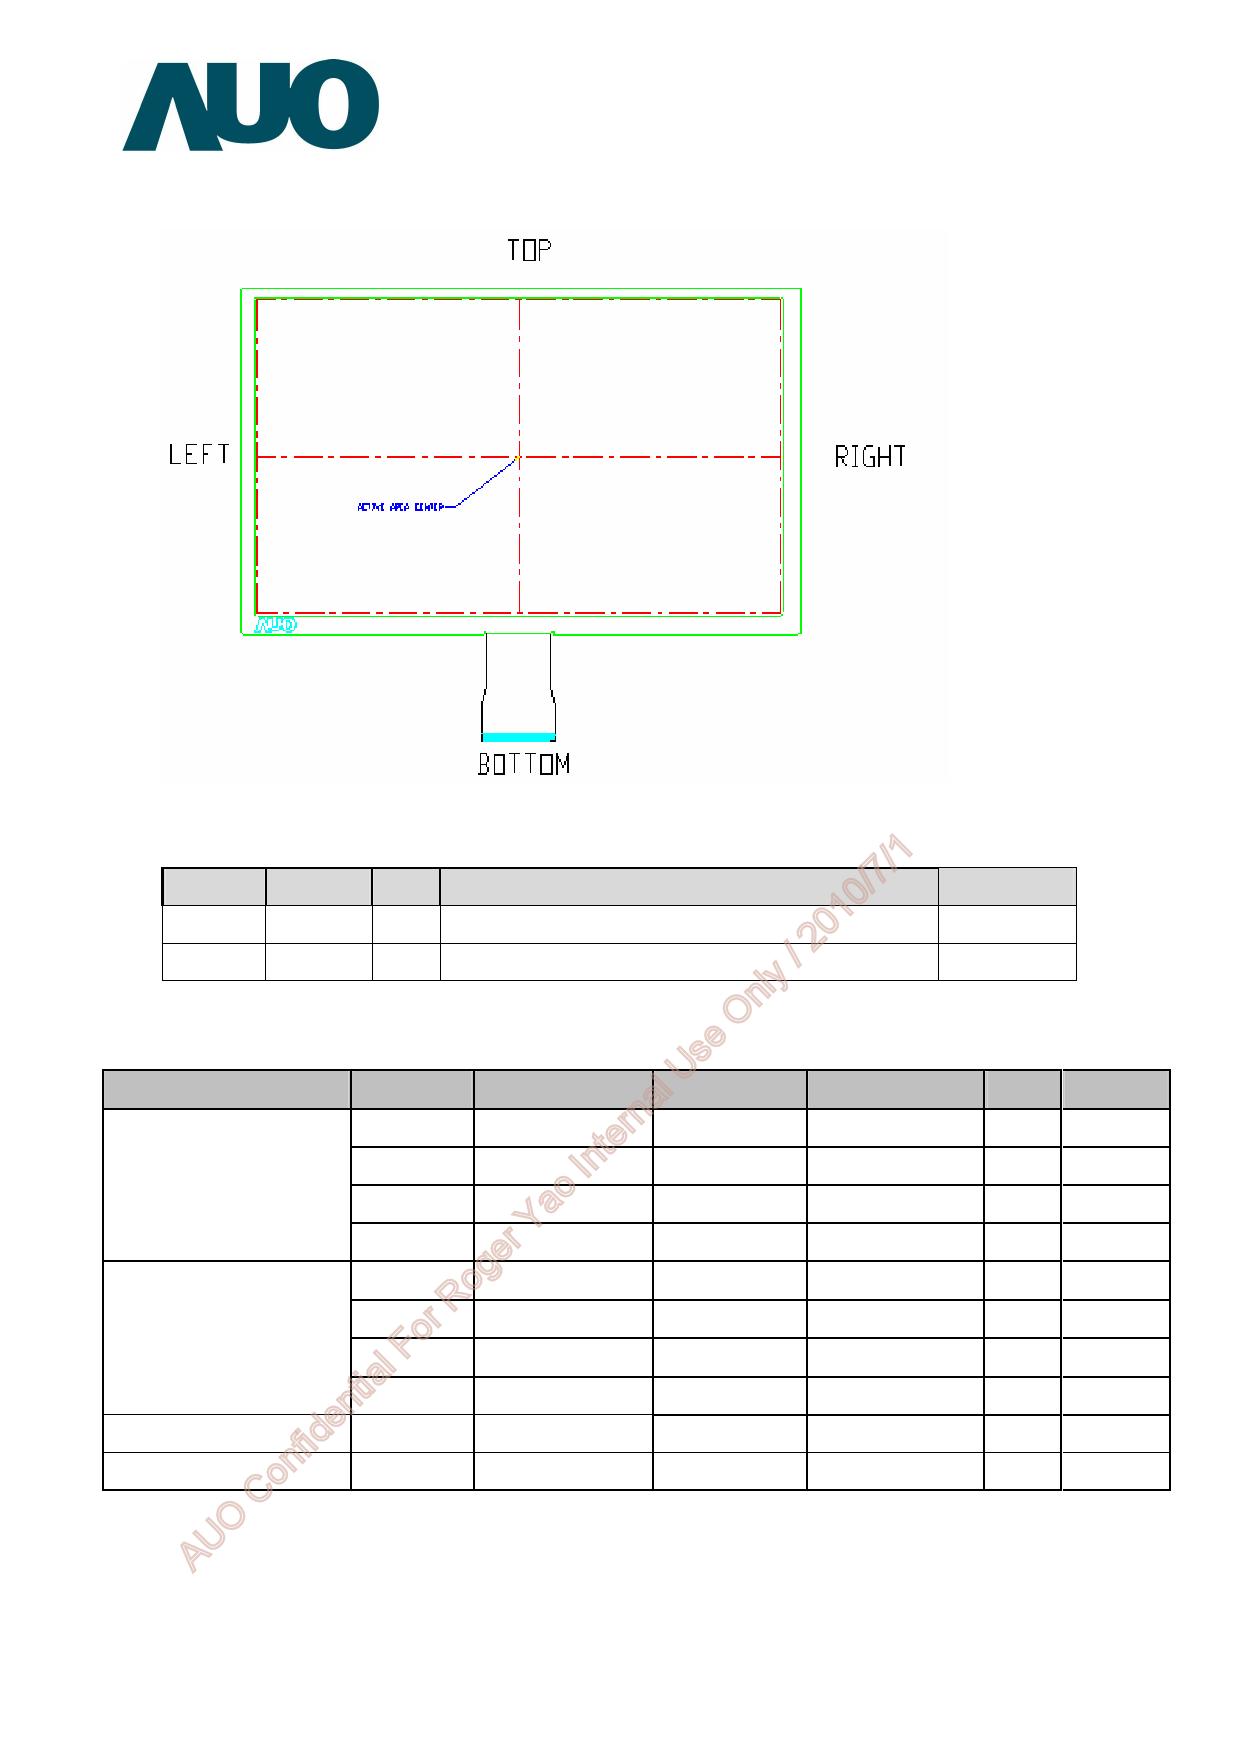 A070VW08-V0 diode, scr